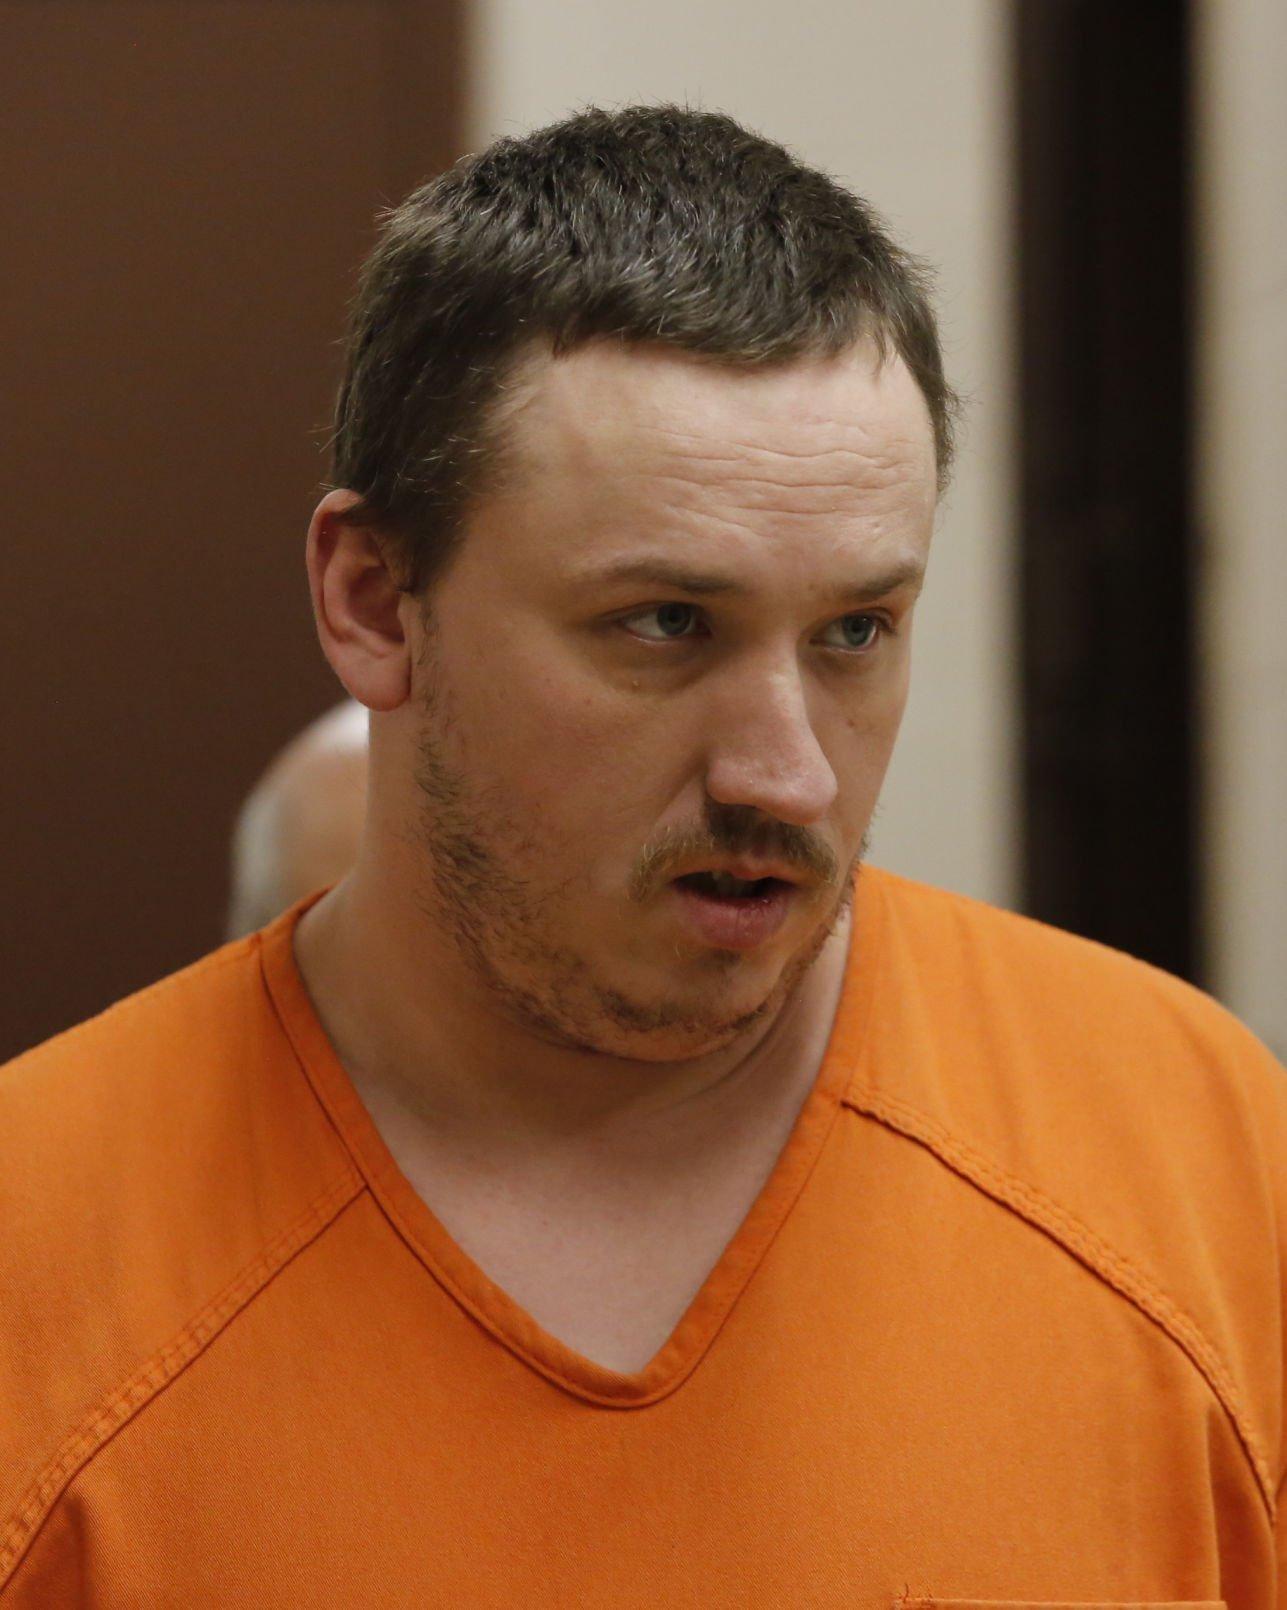 Braxton county wv sex offender